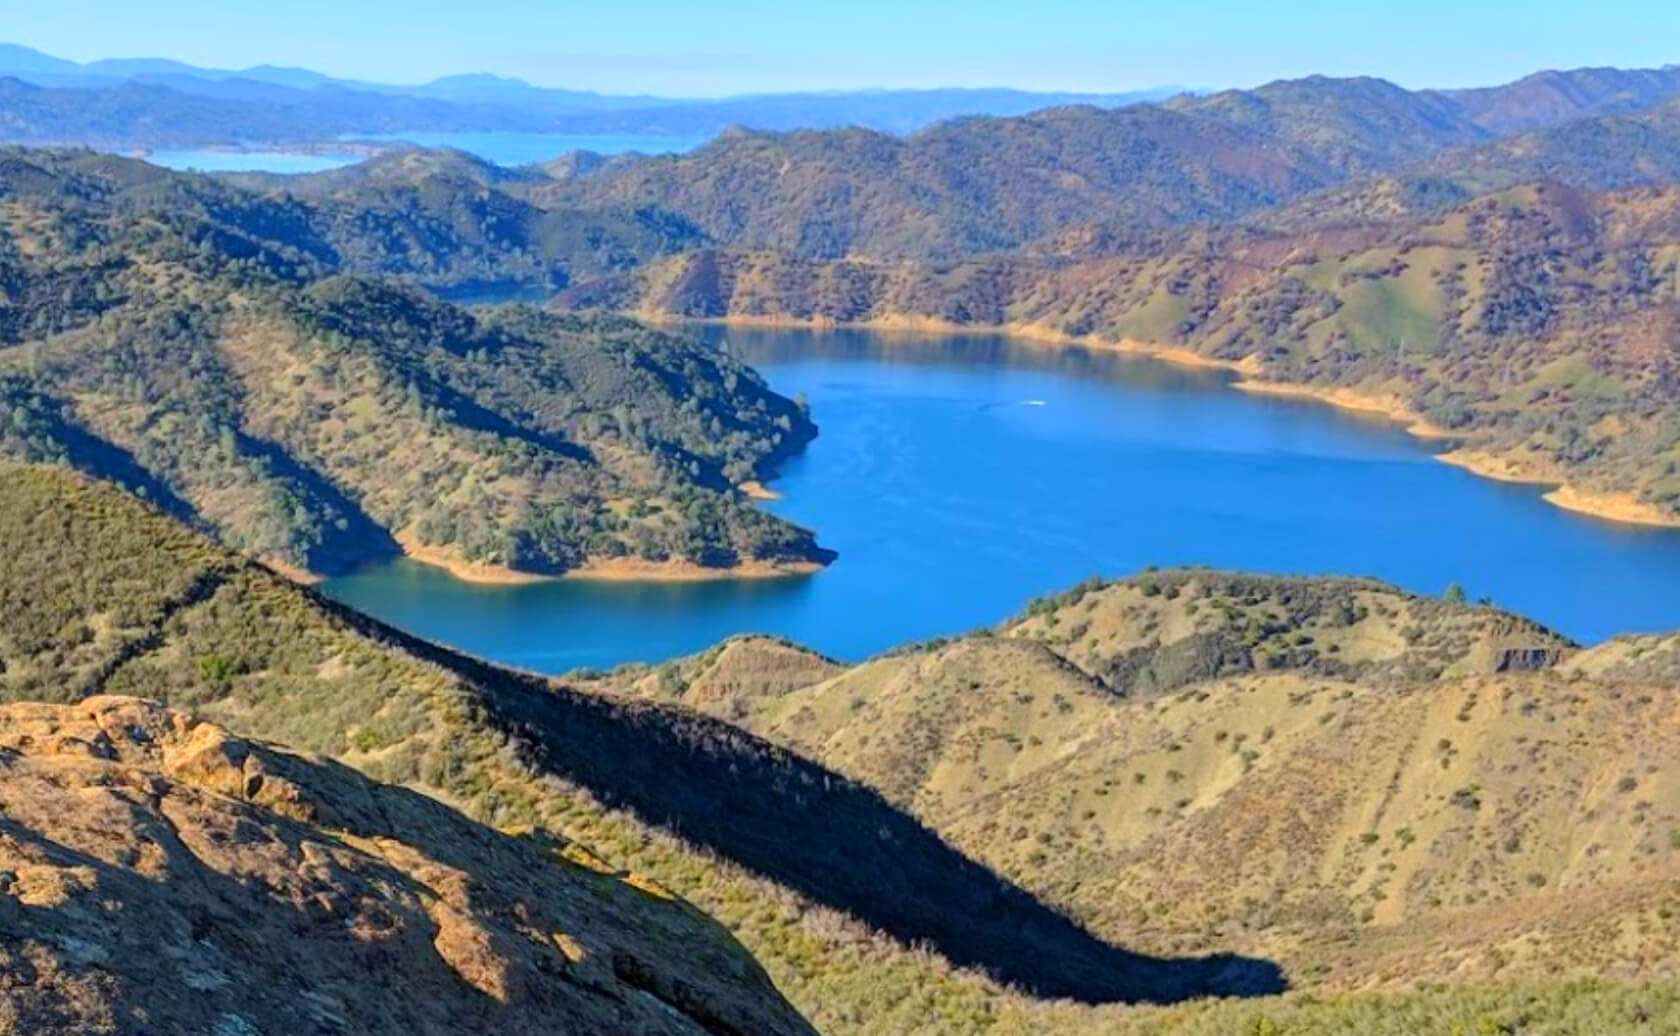 Lake-Berryessa-Fishing-Guide-Report-Napa-CA-04